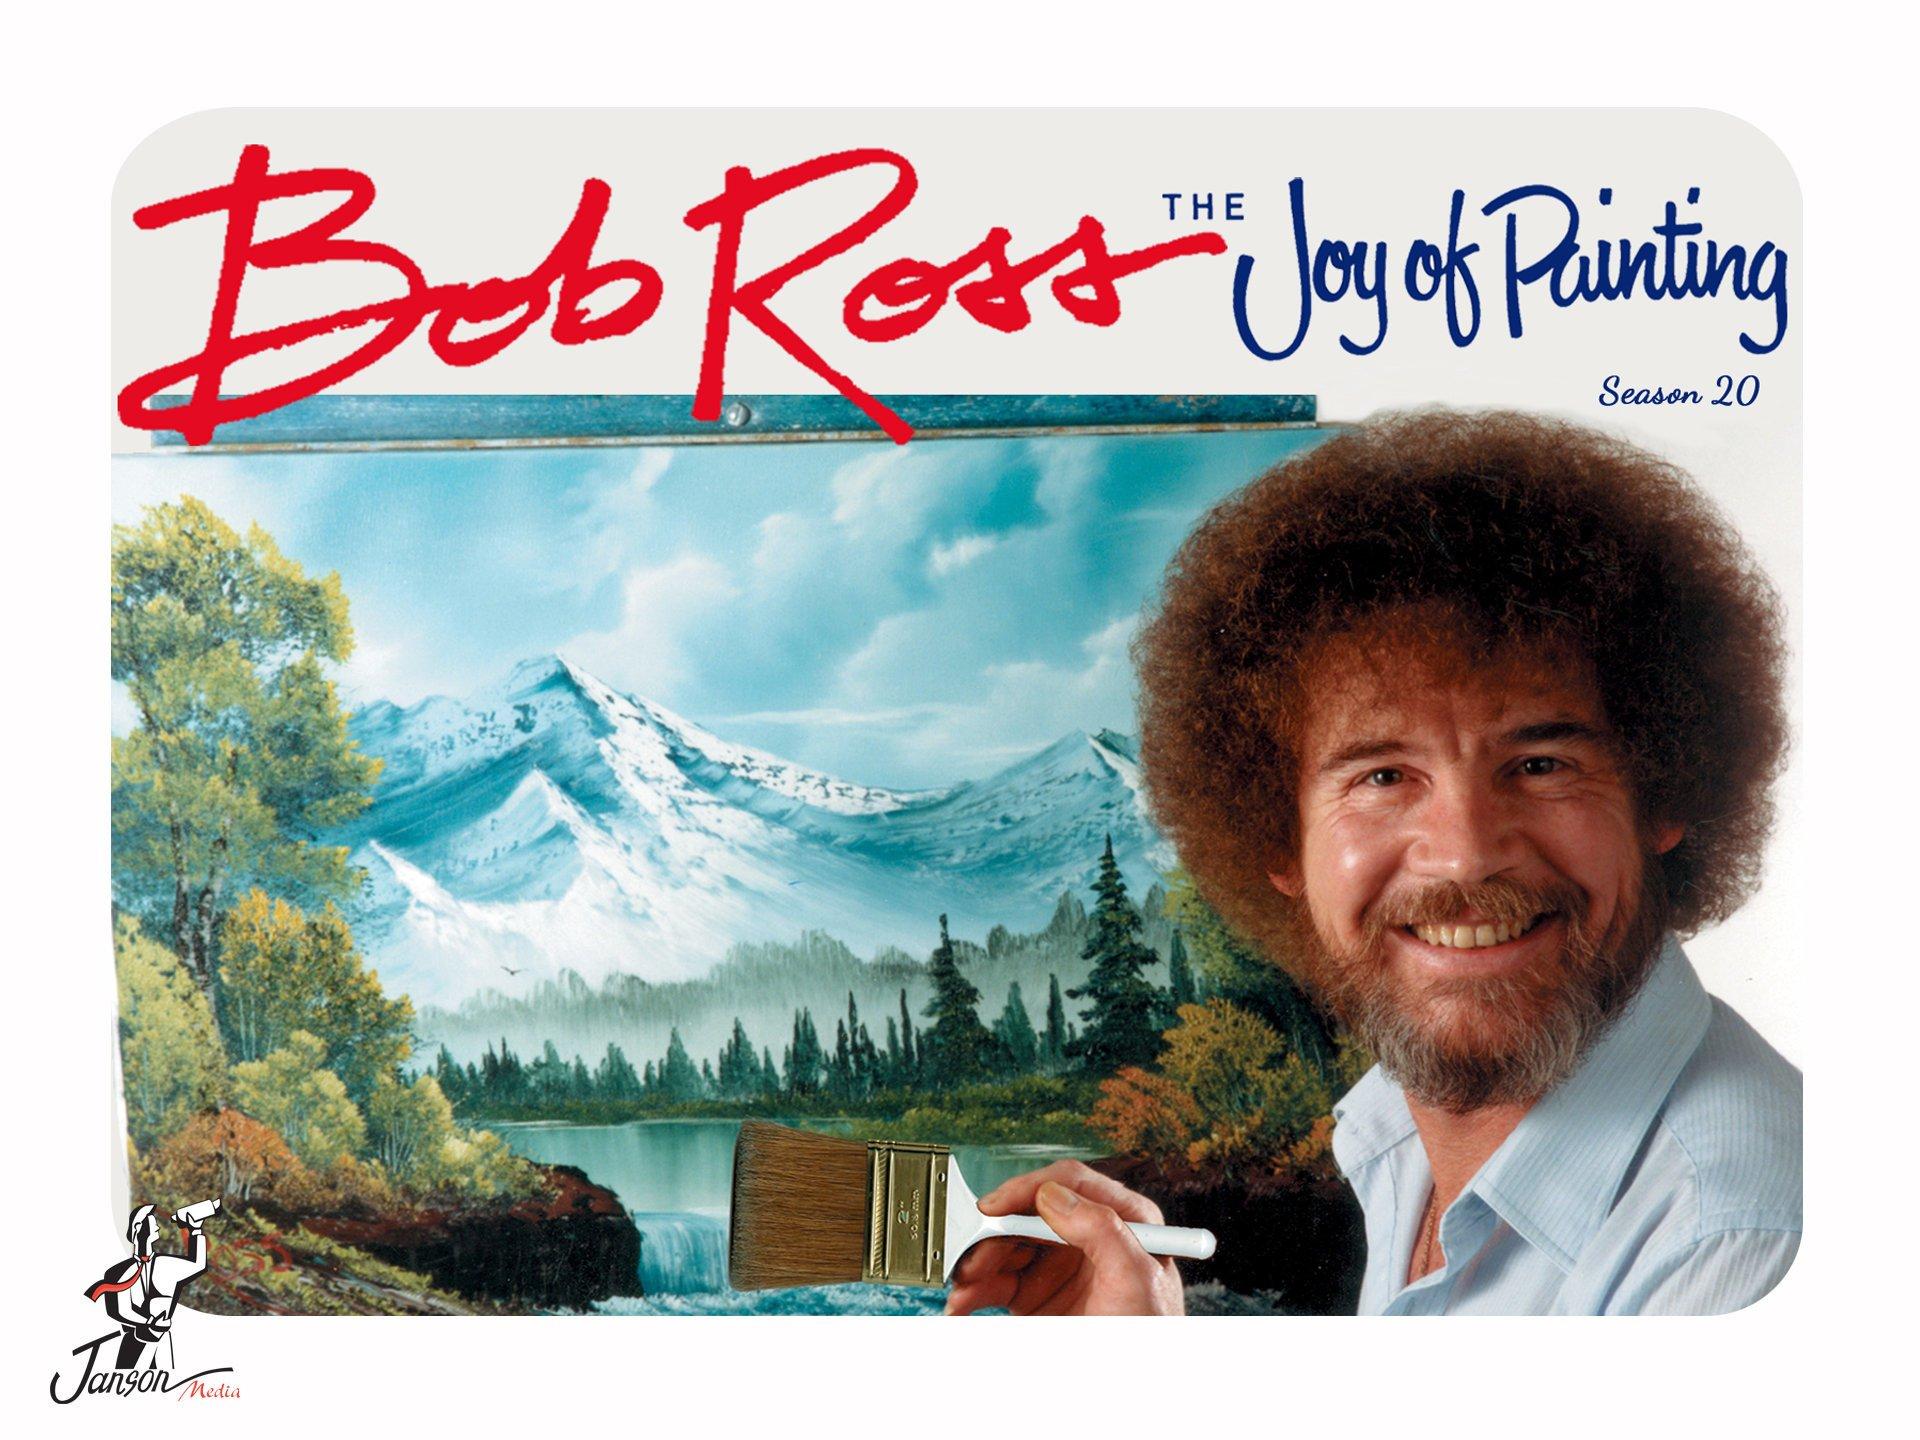 Bob Ross: The Joy of Painting - Season 20